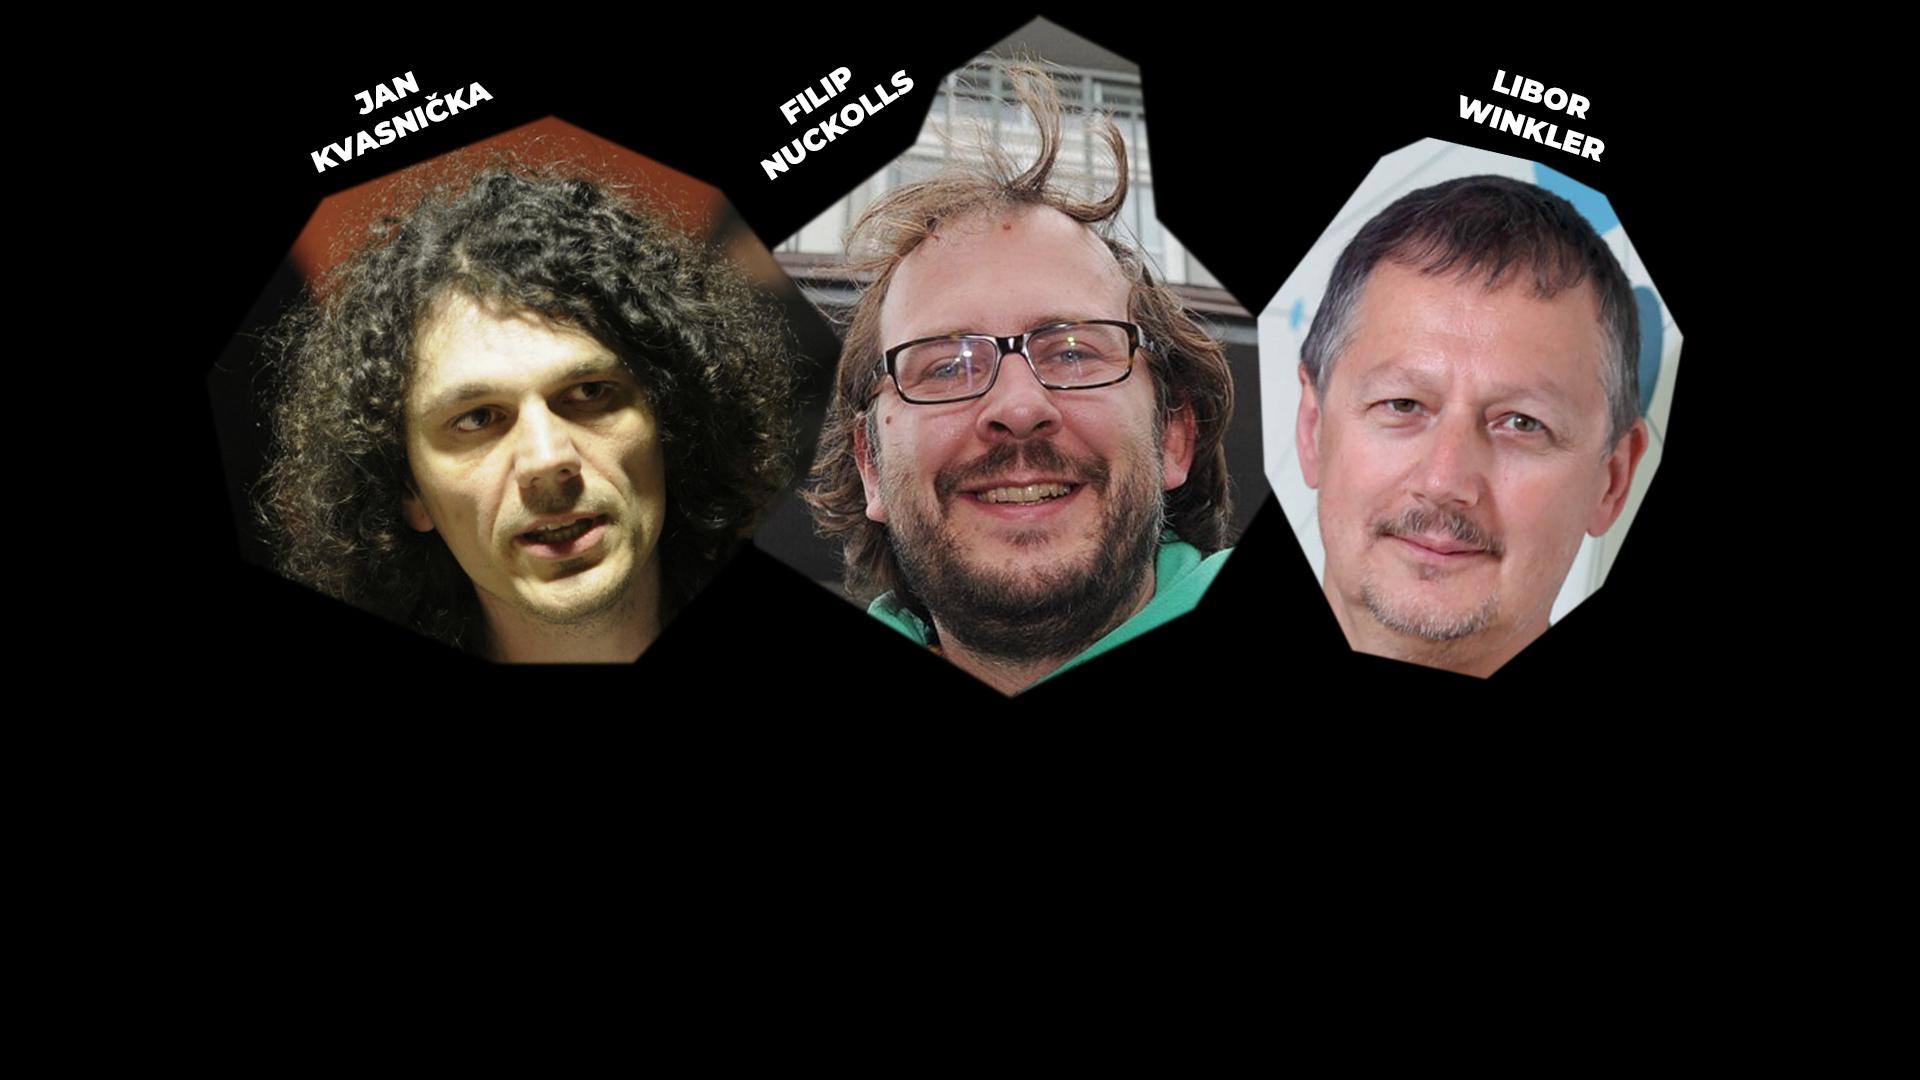 TŘI U STOLU – Libor Winkler, Jan Kvasnička a Filip Nuckolls – záznam